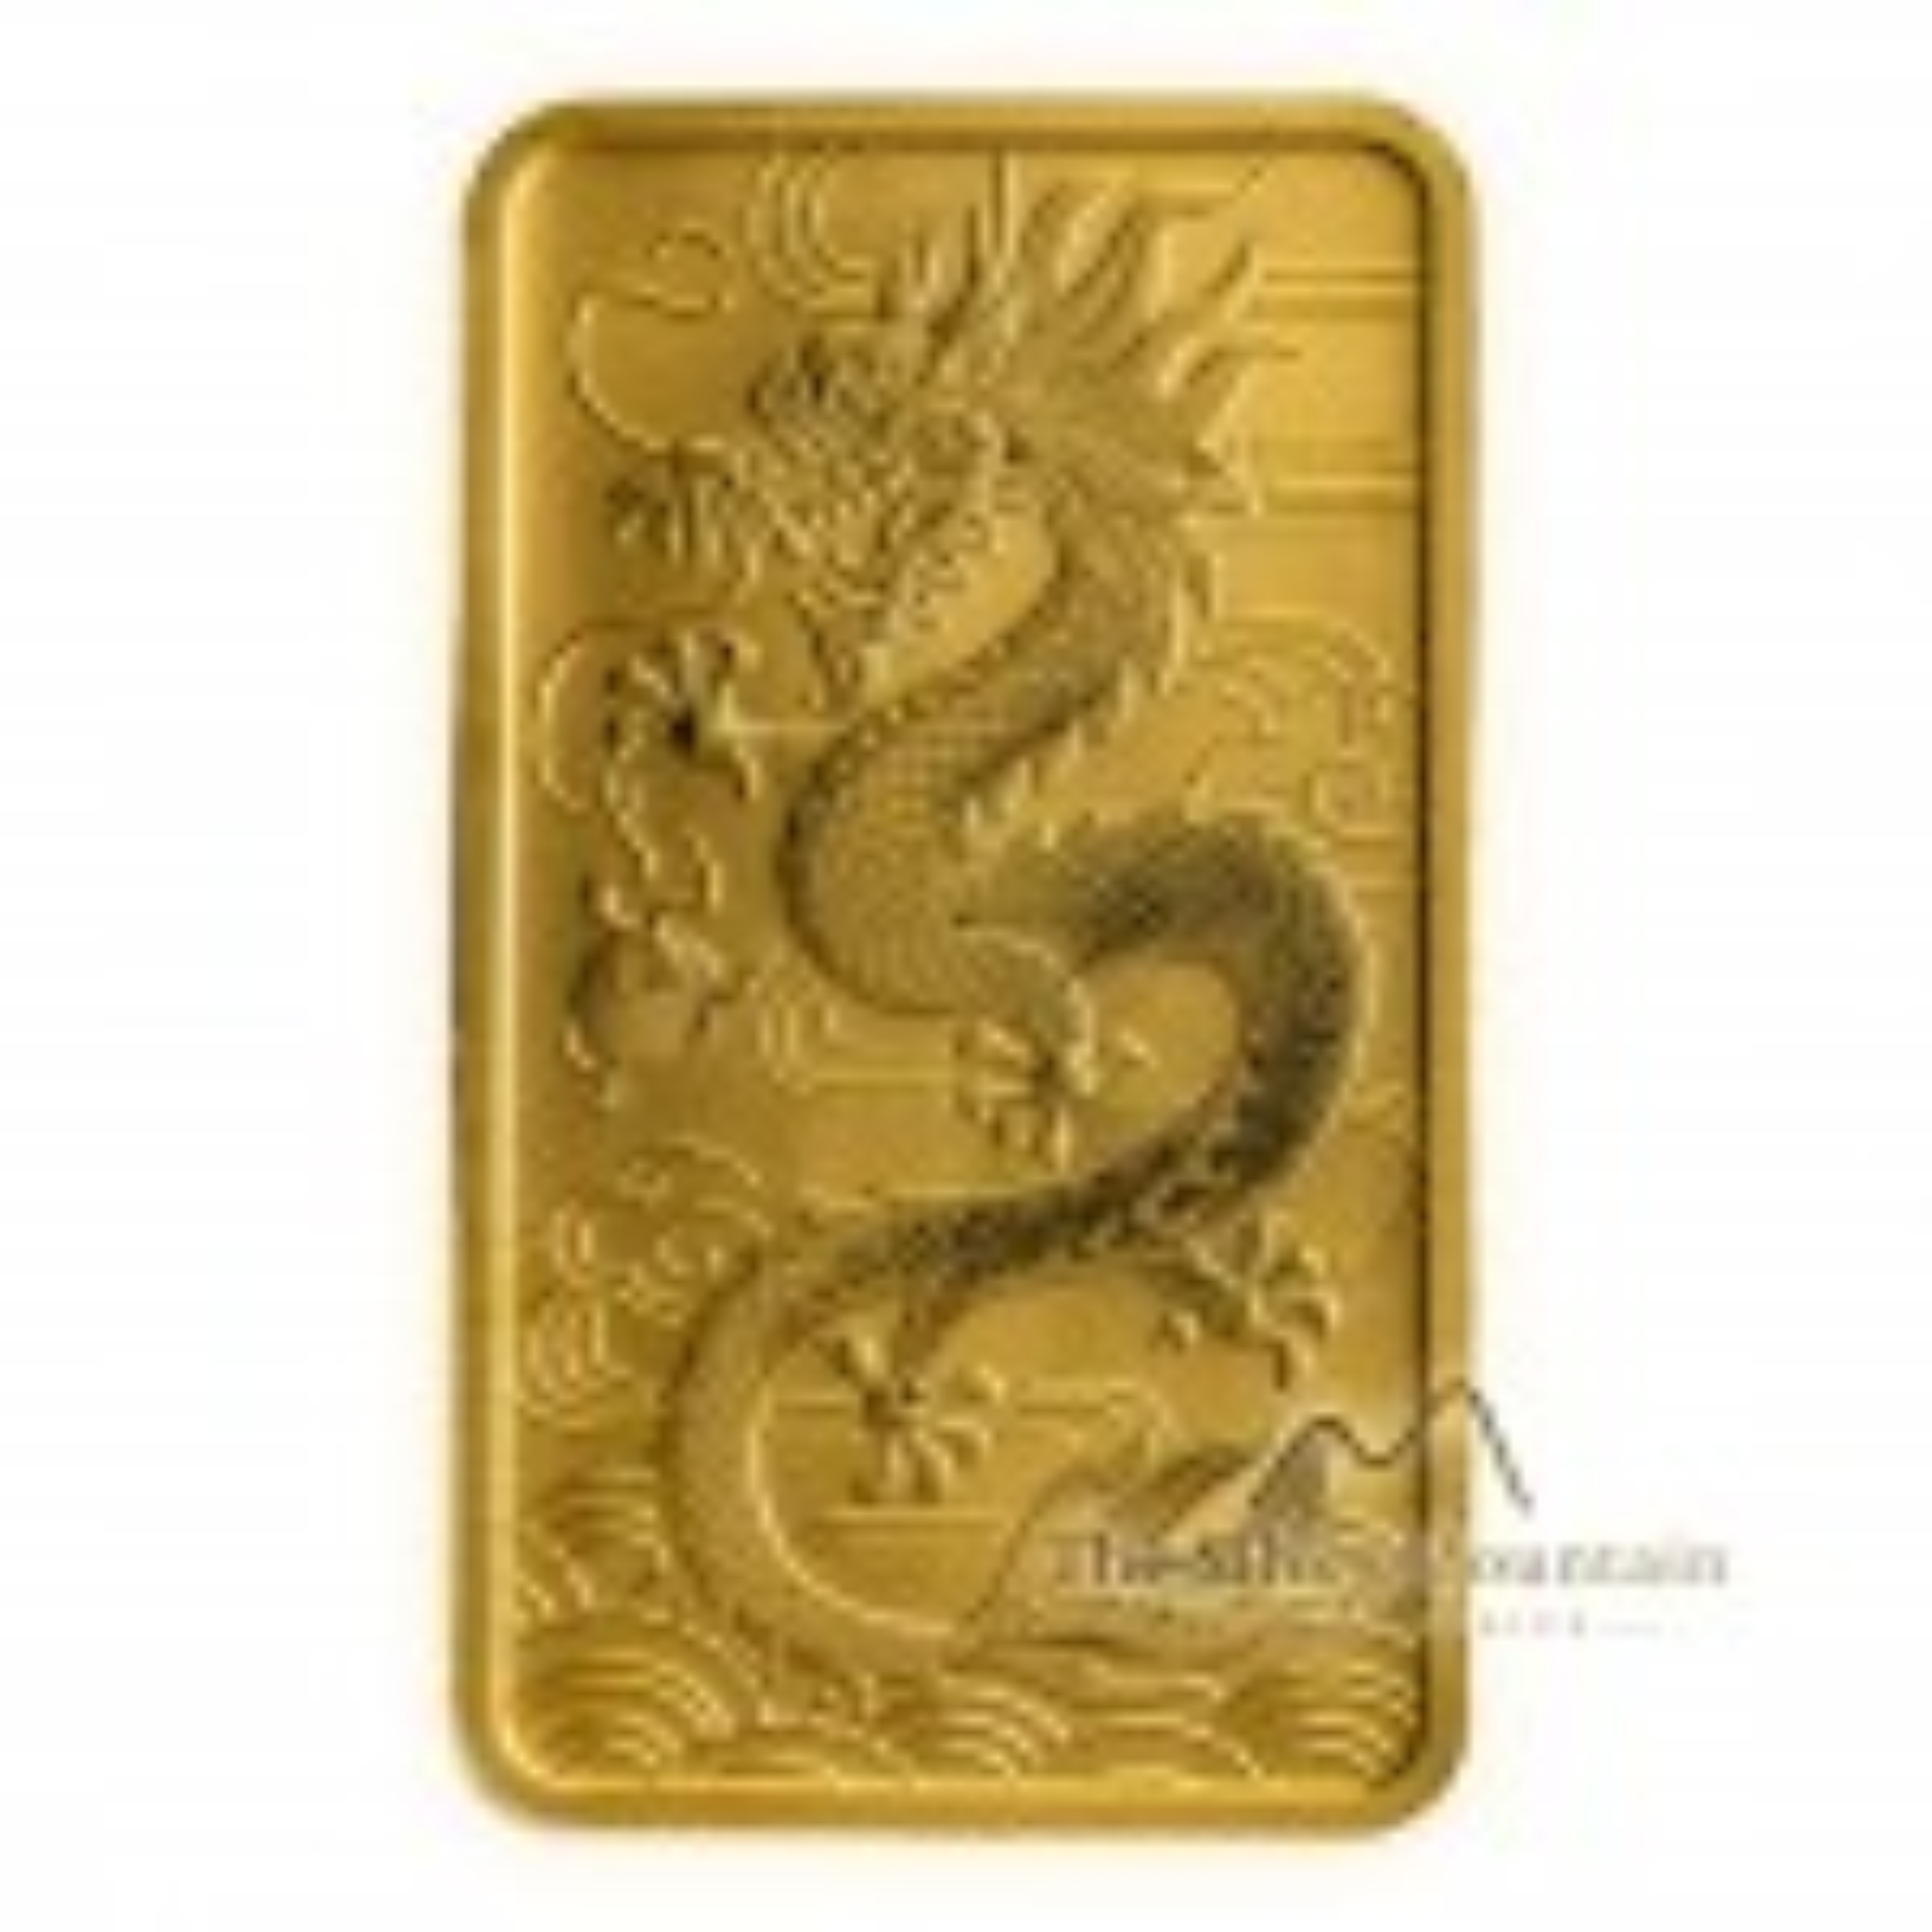 1 Troy ounce gold coin bar Rectangular Dragon 2018